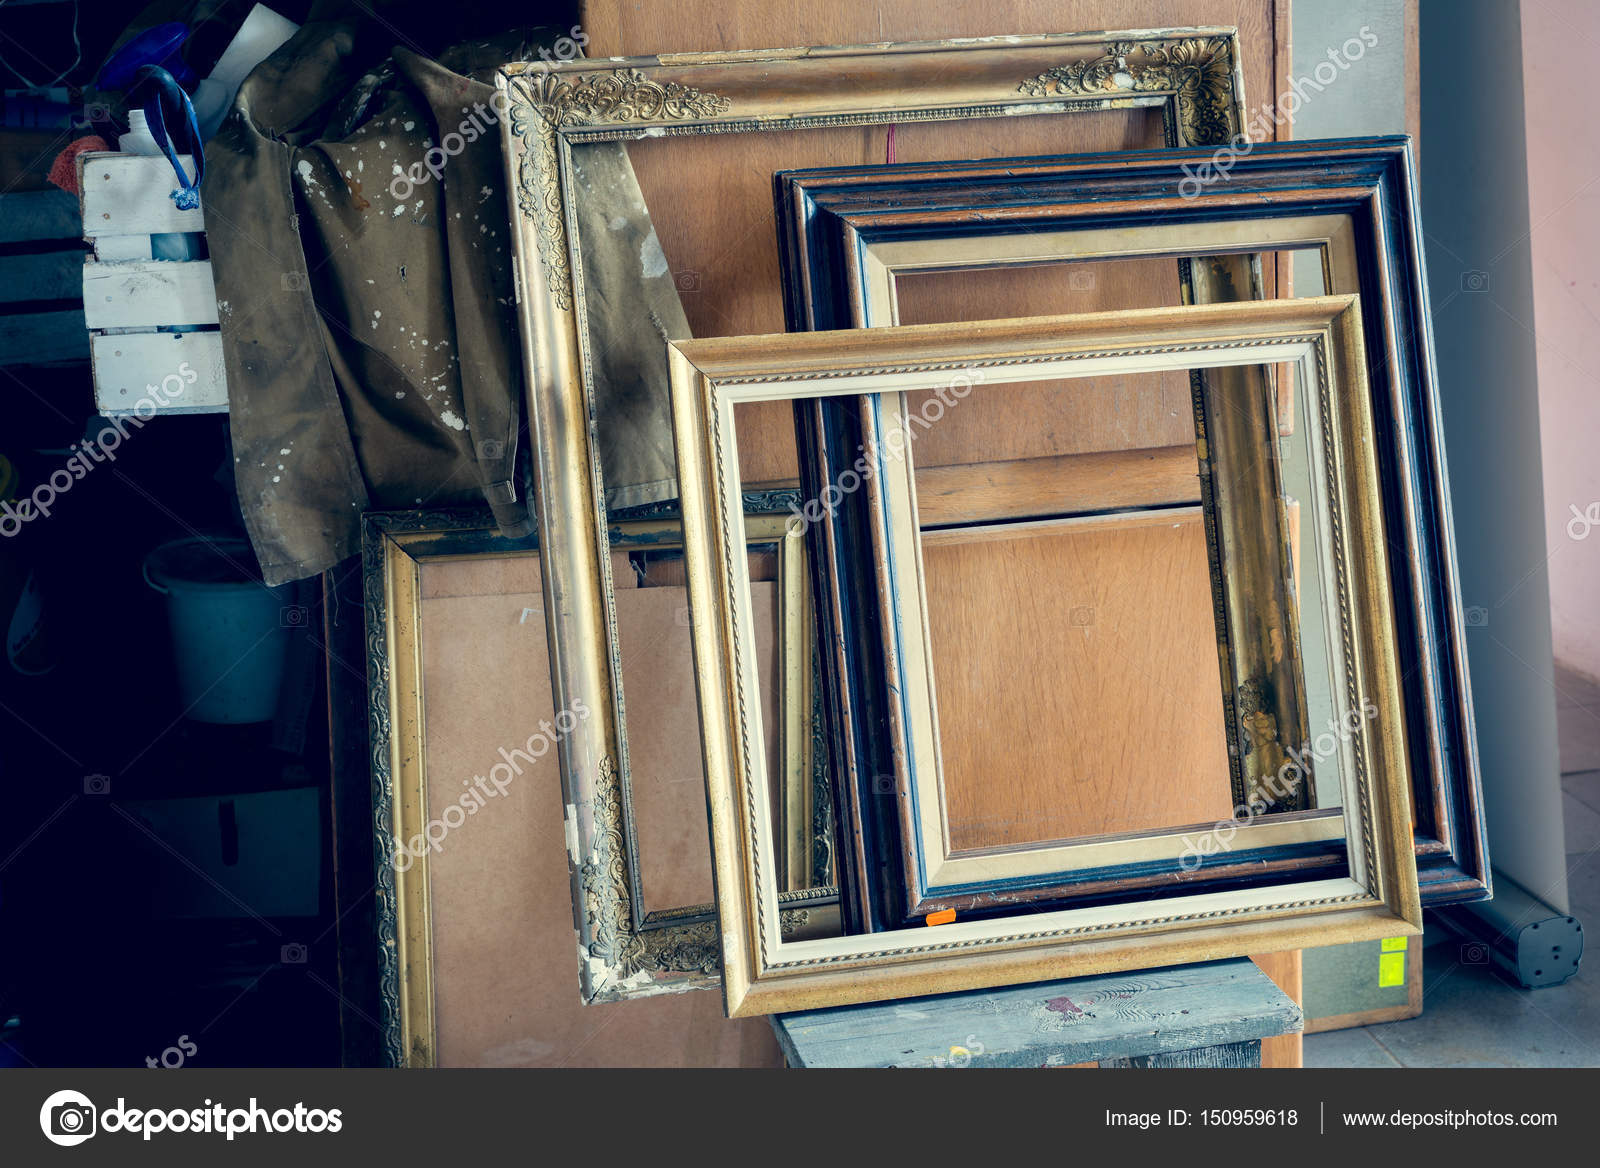 Marcos de cuadros viejos — Foto de stock © muzzyco #150959618